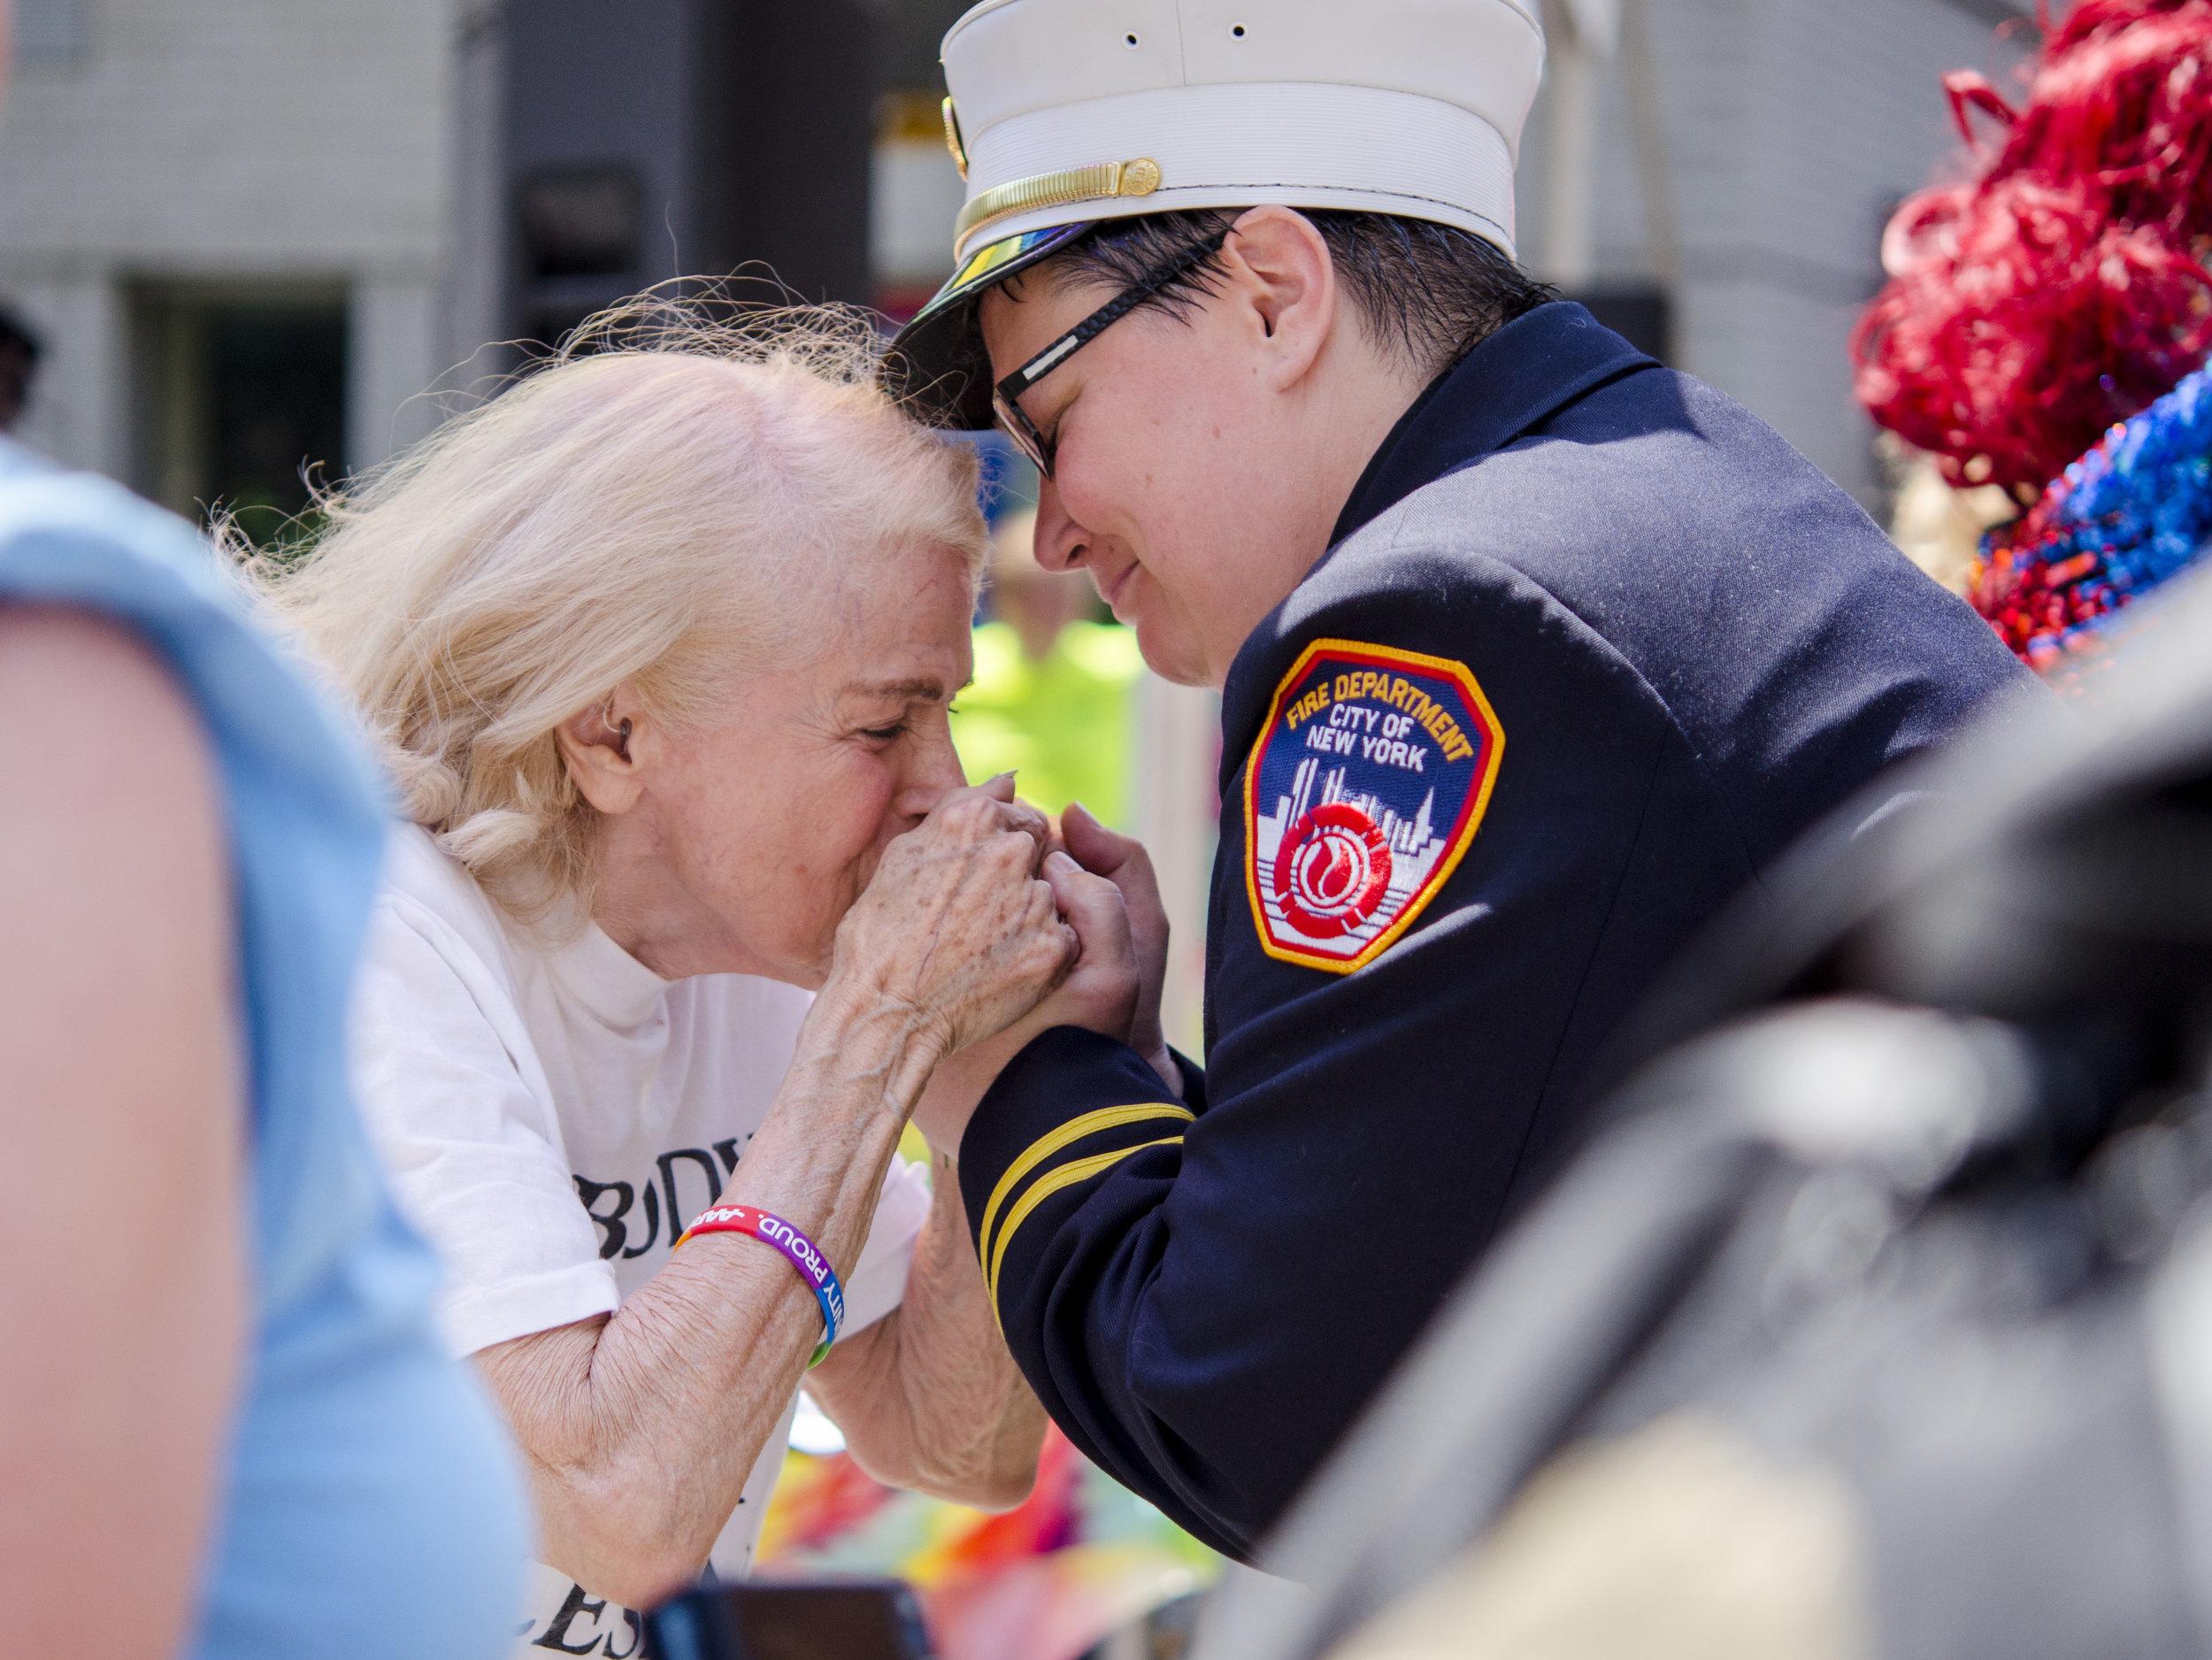 PrideParadeNYC2016_DanniSiminerio-40.jpg